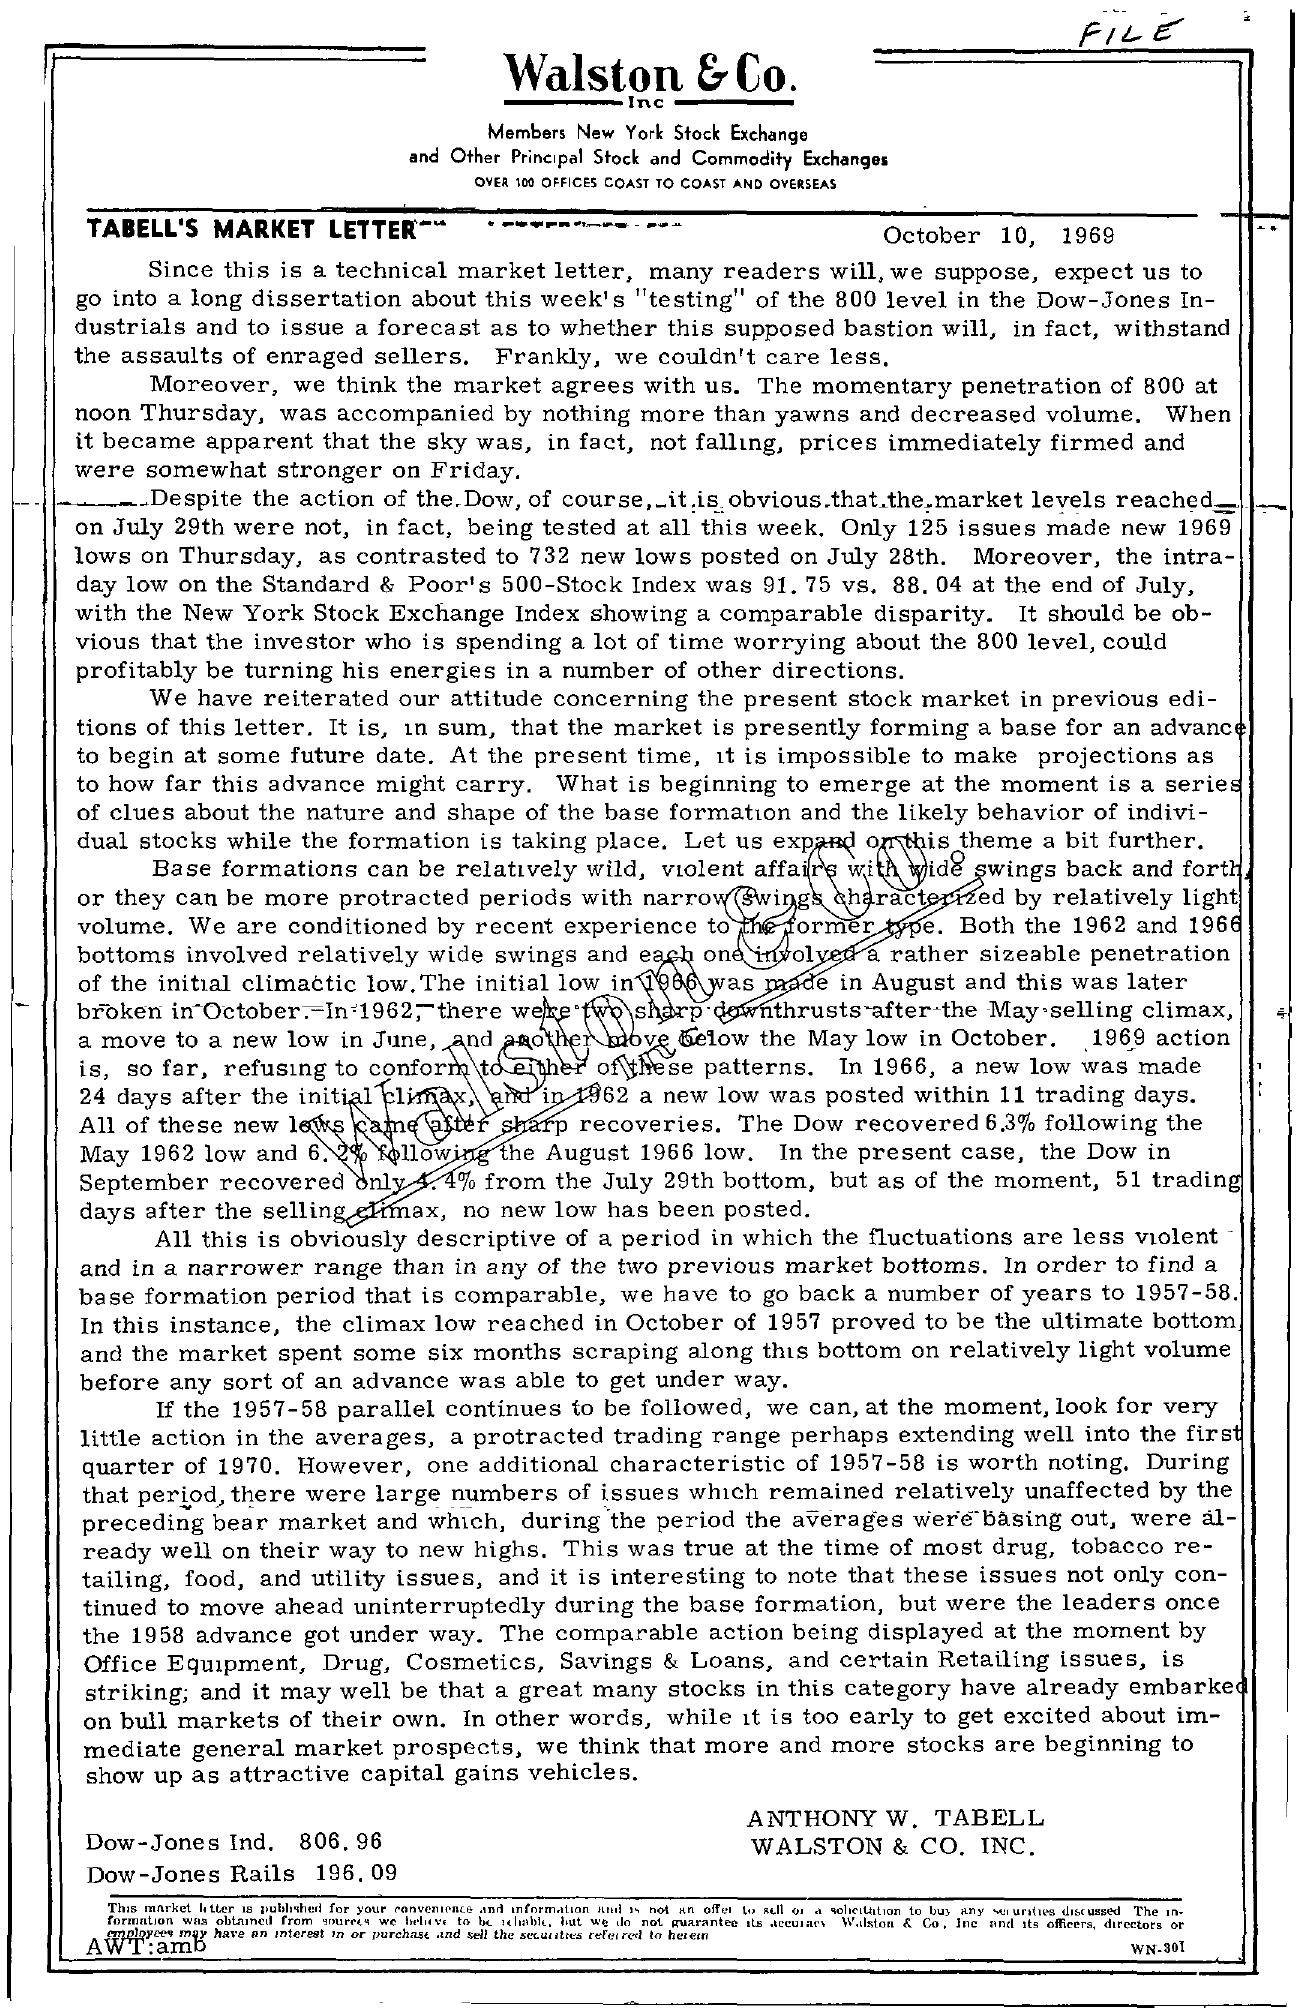 Tabell's Market Letter - October 10, 1969